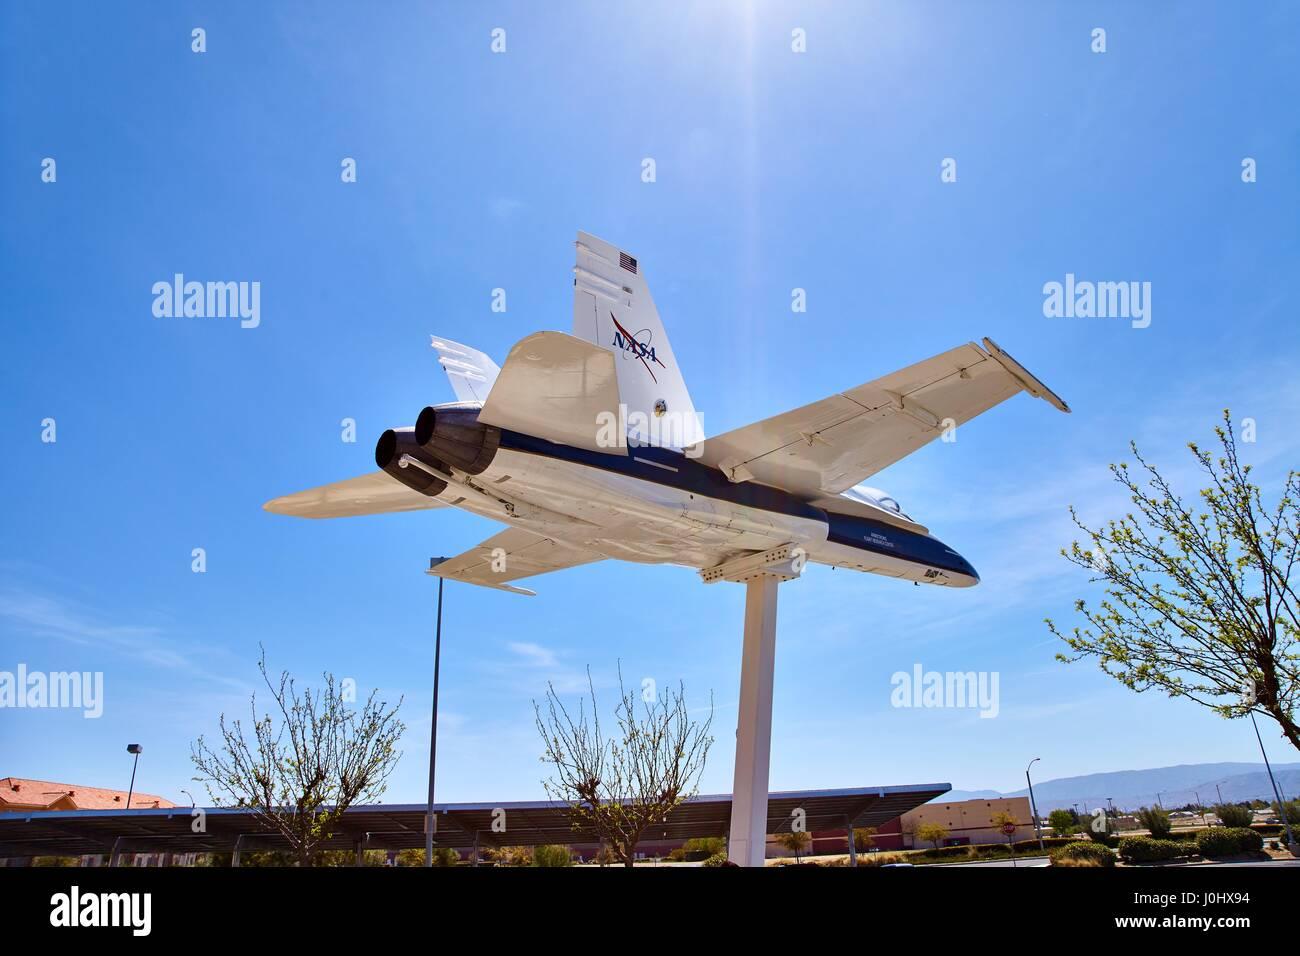 JetHawks, Lancaster, California, USA - April 5, 2017 :JetHawks, Lancaster, California, USA. The NASA F18 aircraft - Stock Image